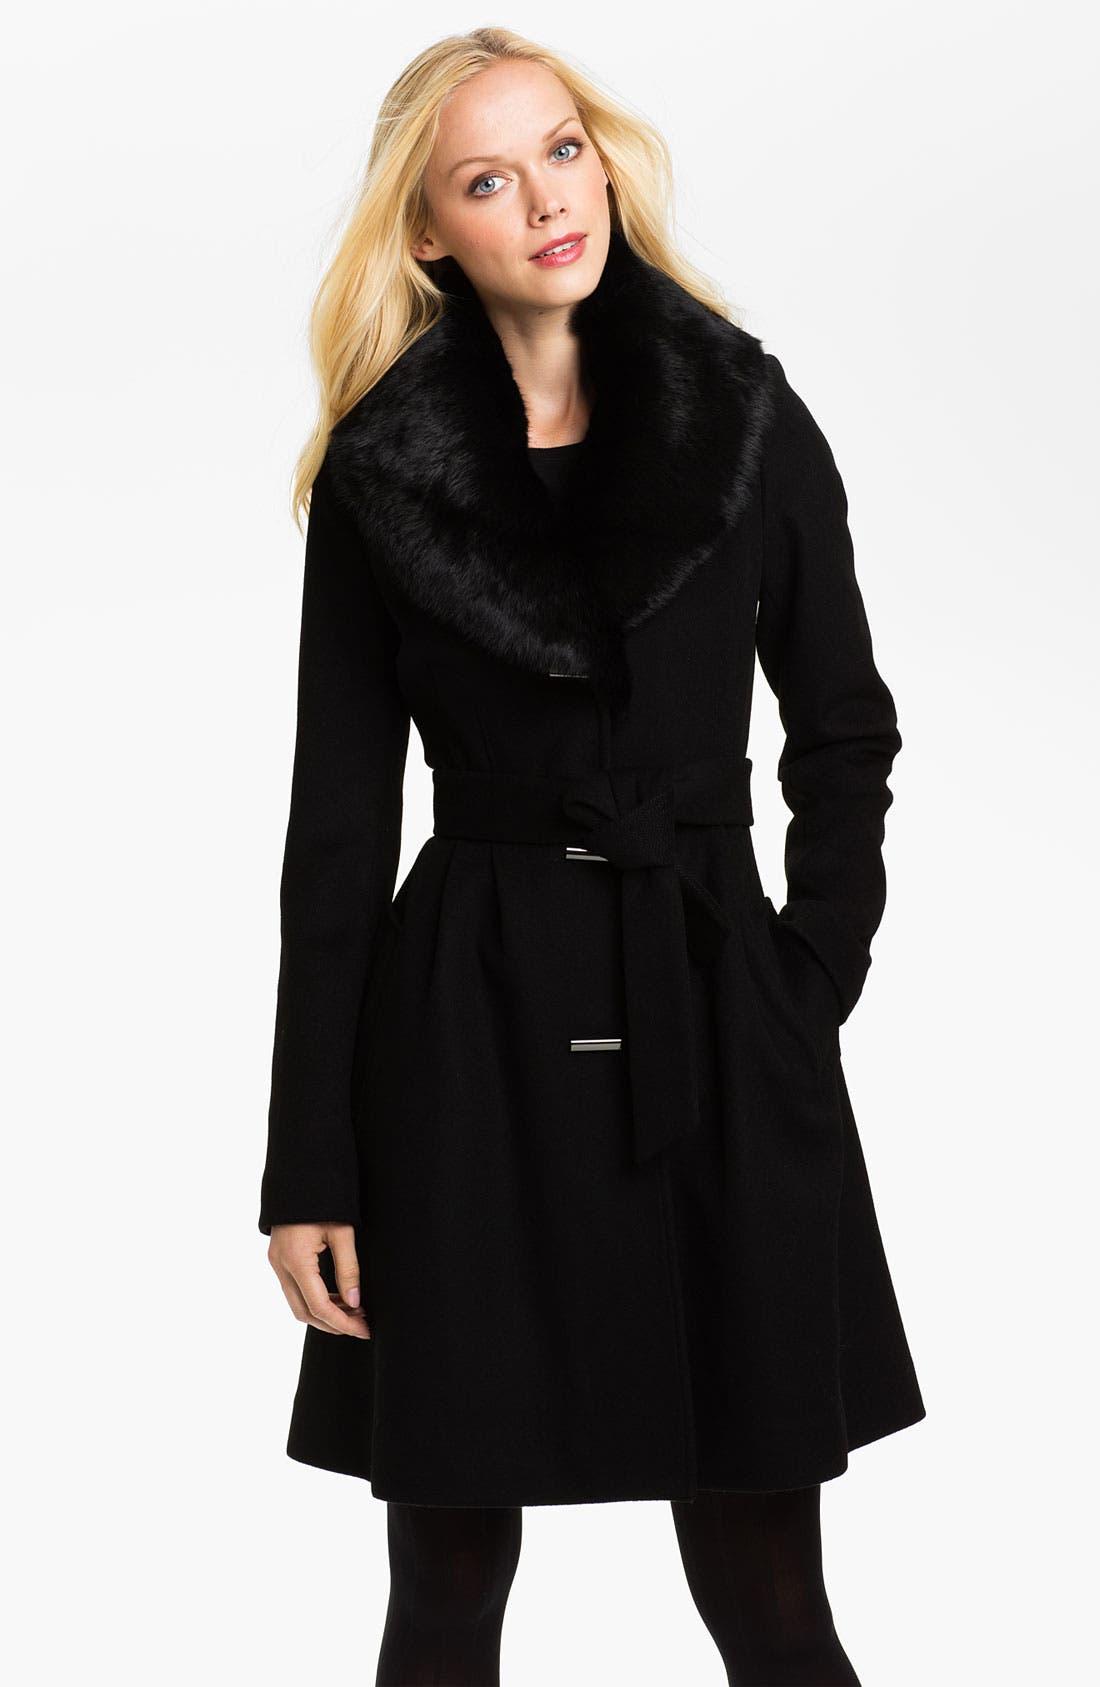 Alternate Image 1 Selected - Badgley Mischka 'Julia' Genuine Rabbit Collar Coat